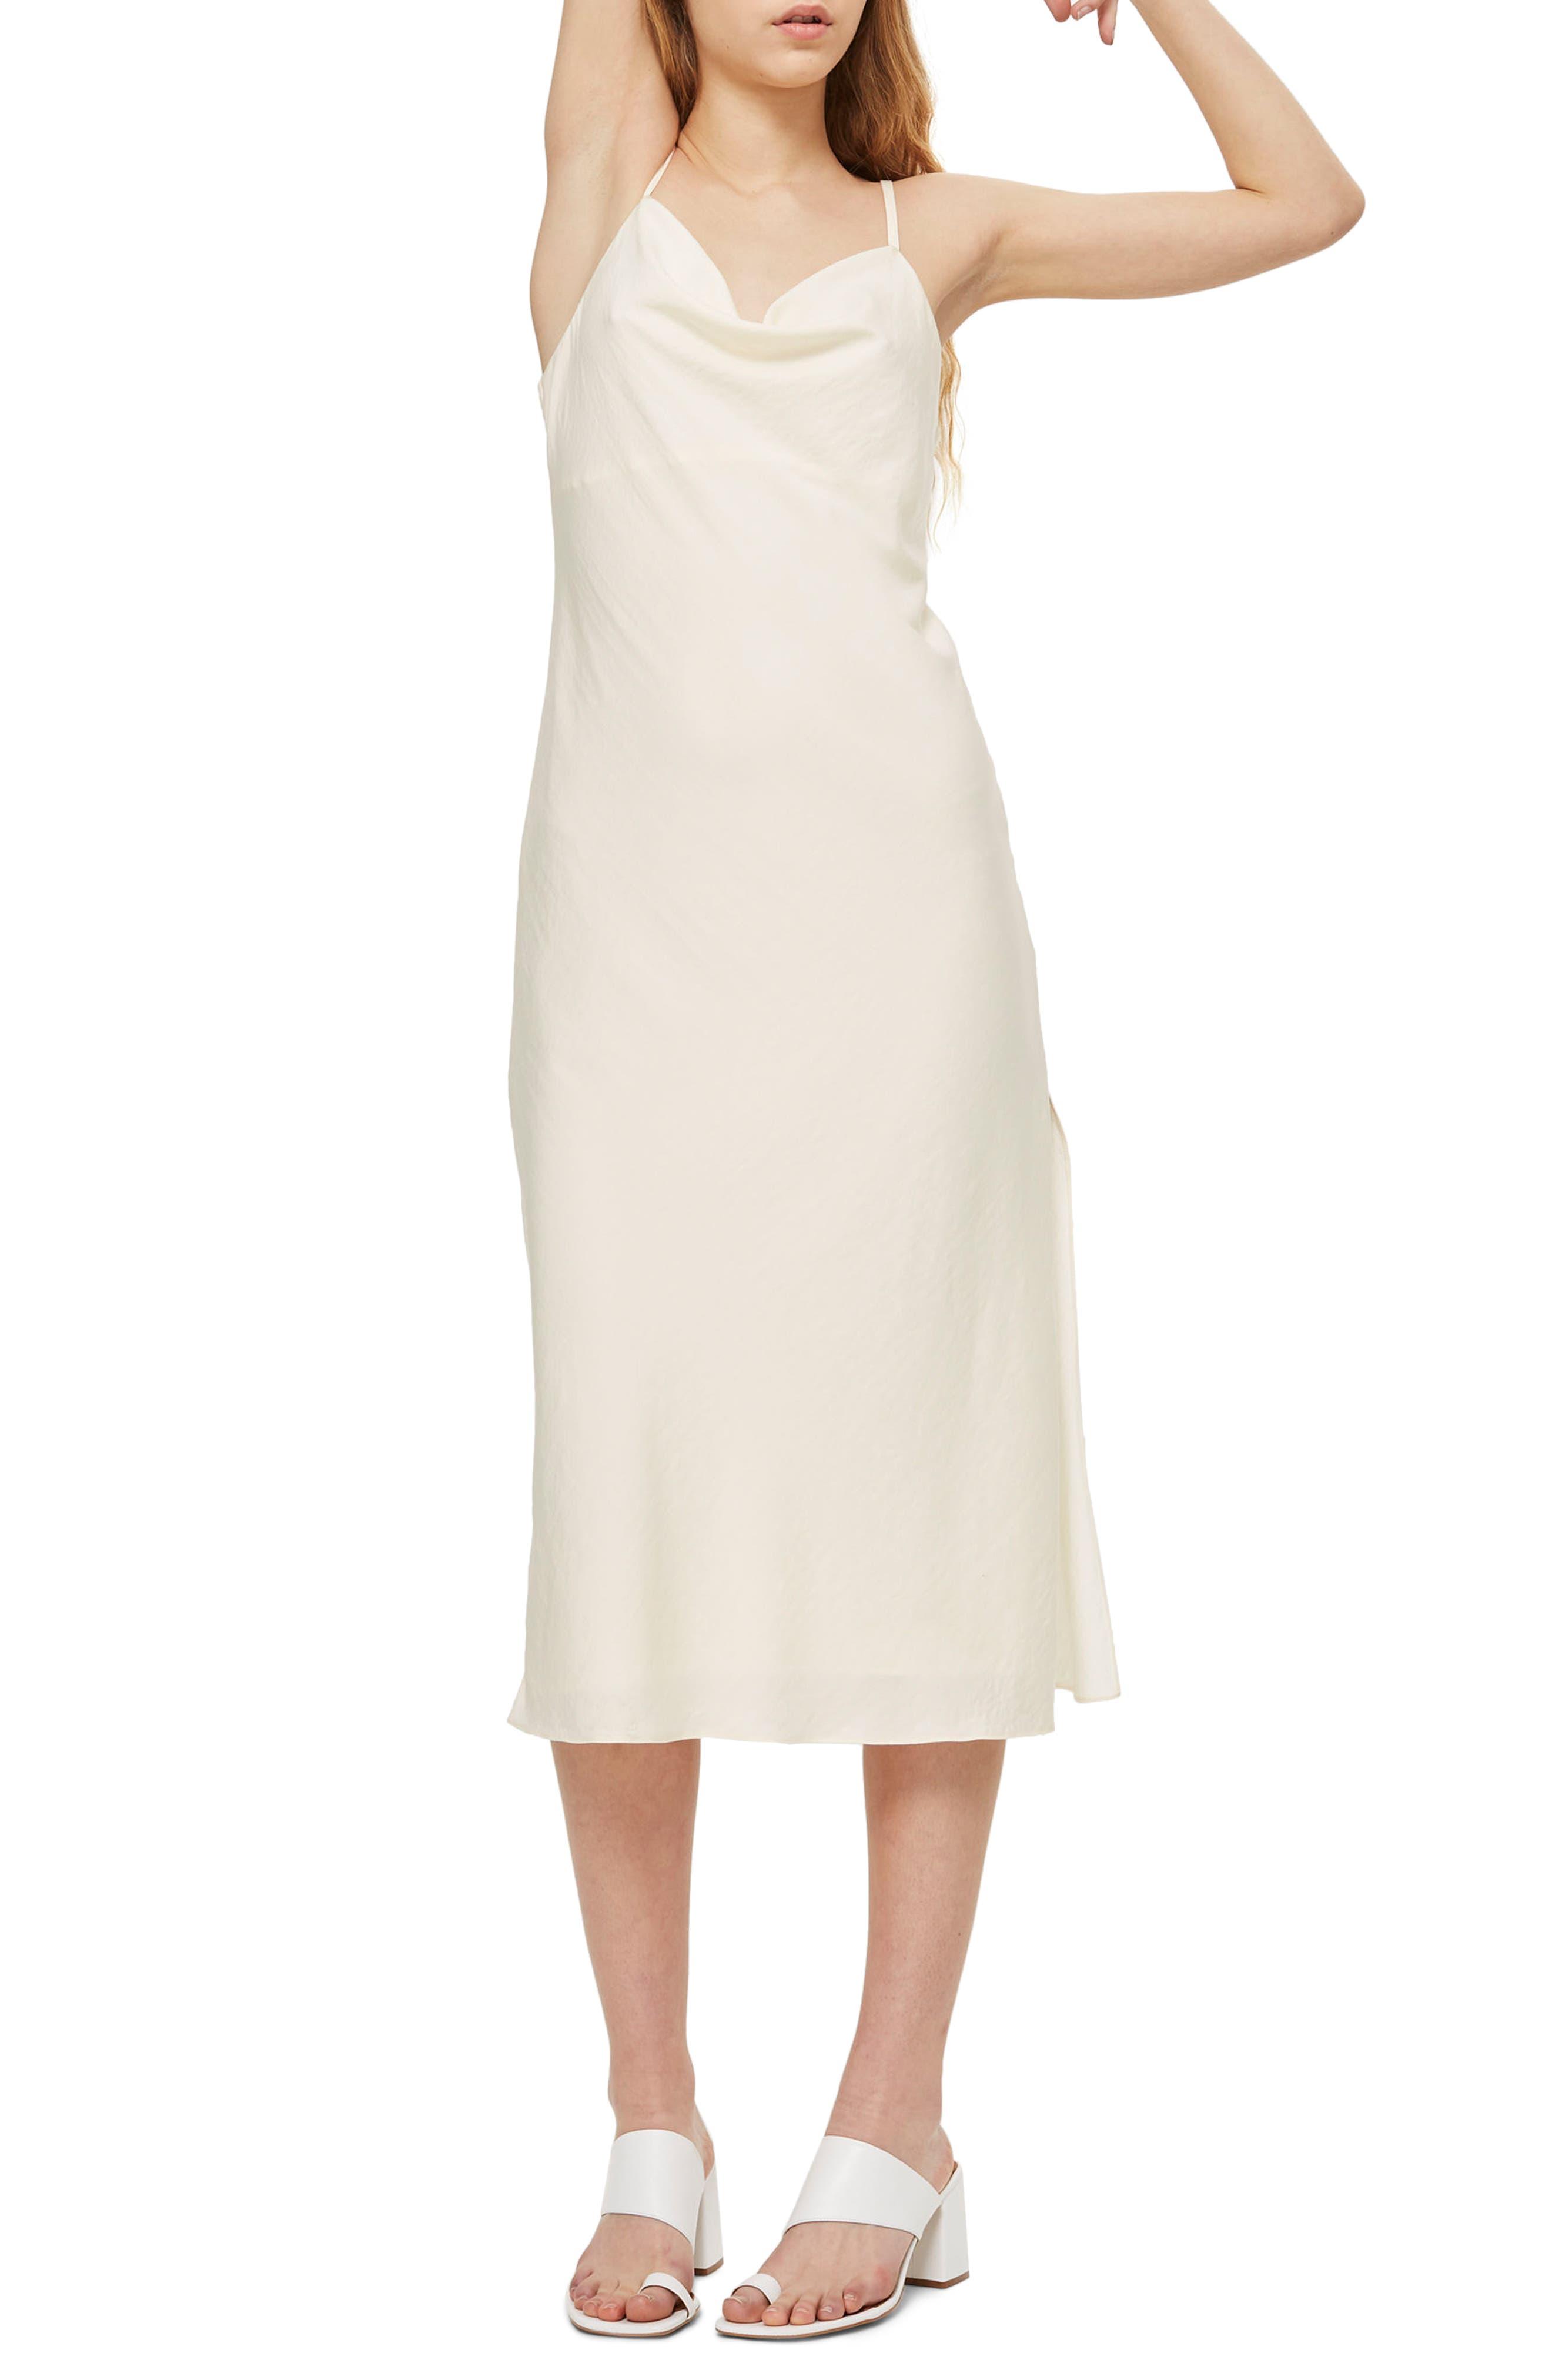 Topshop Cowl Neck Satin Midi Dress